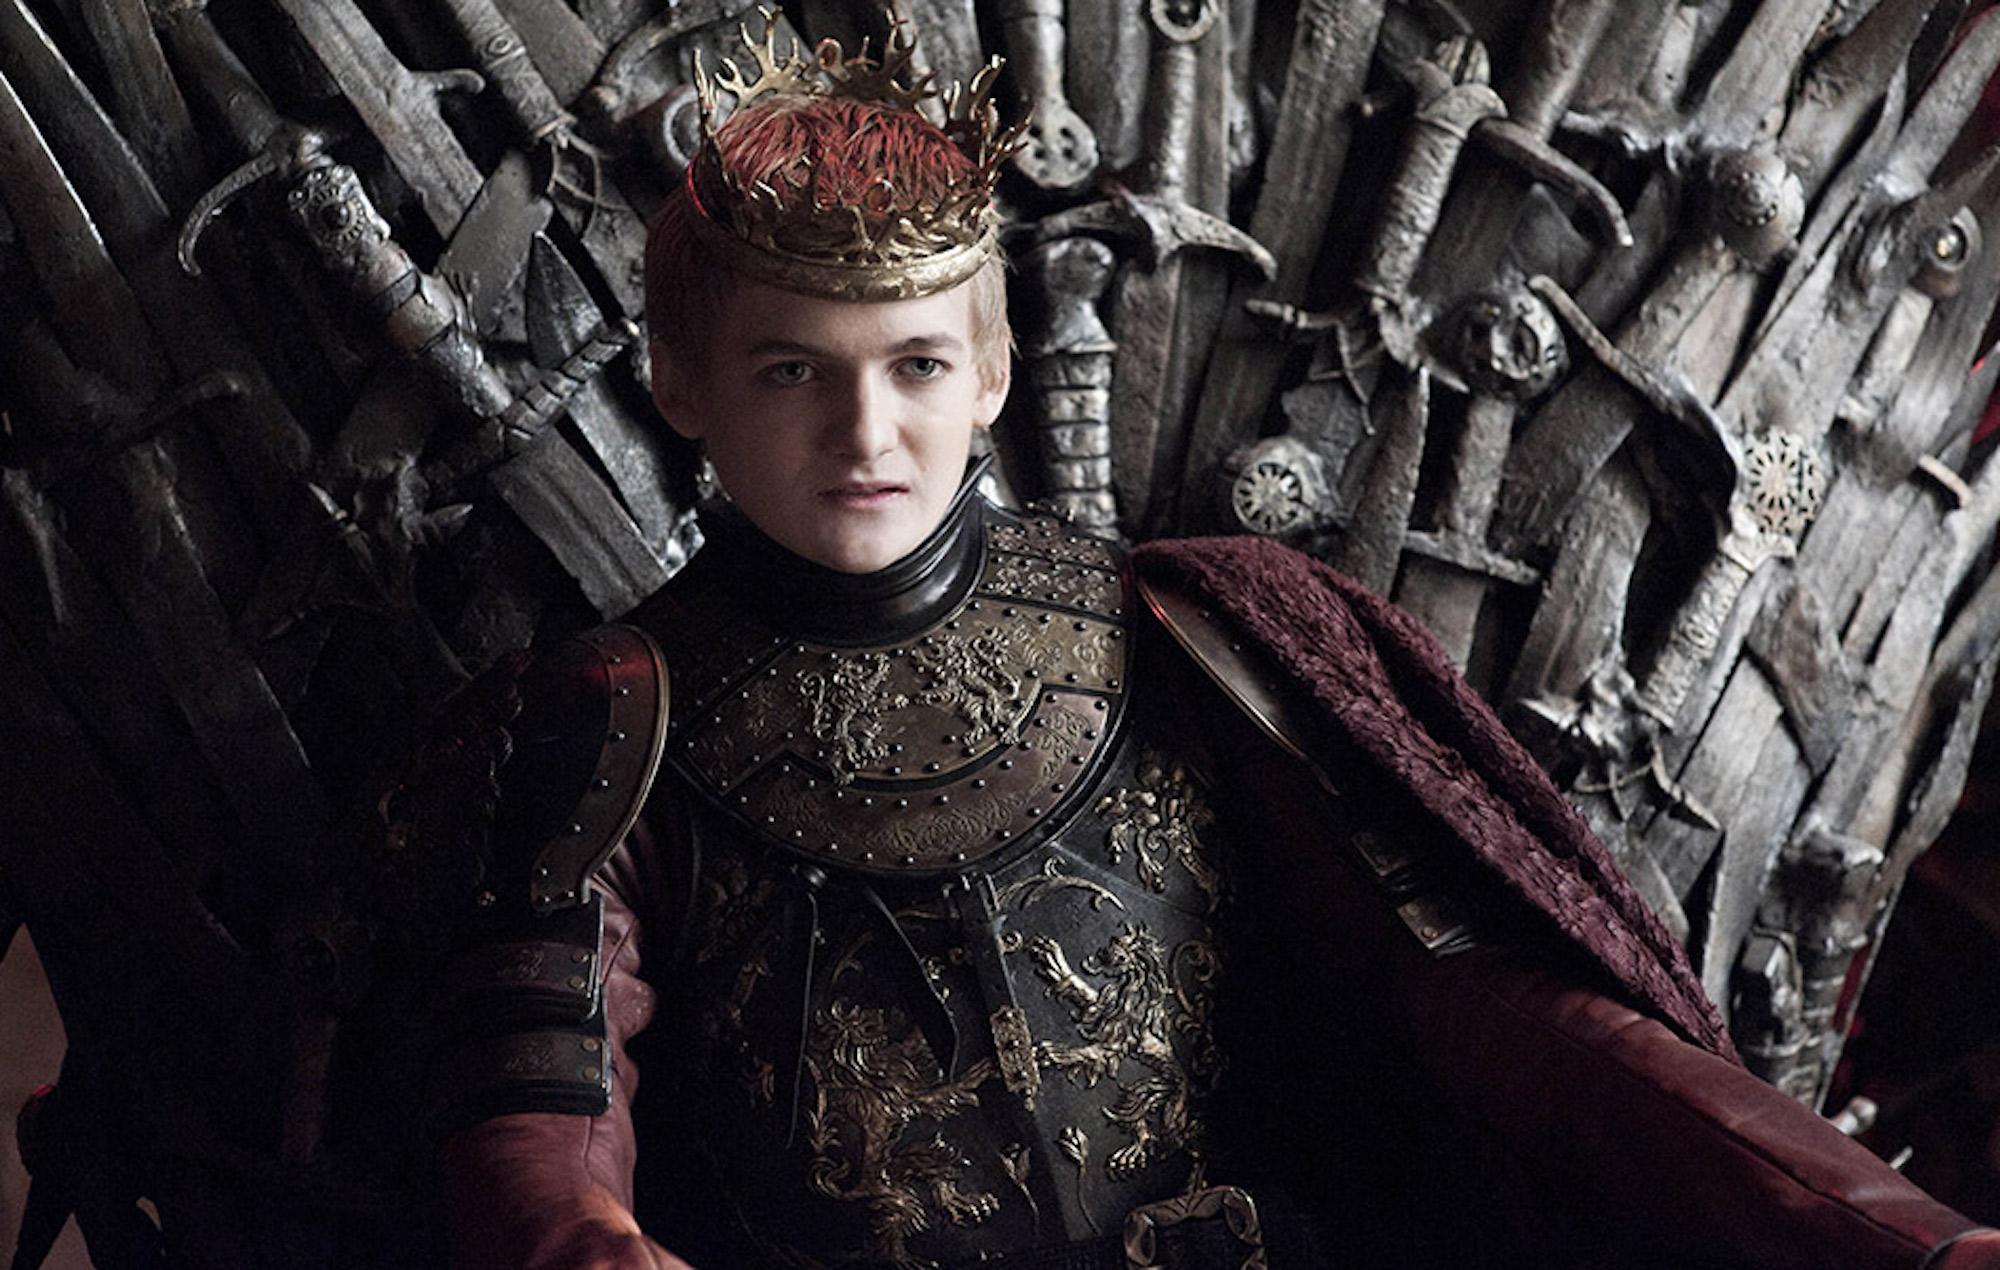 'Game Of Thrones' leaked storyline reveals Joffrey's original murderer